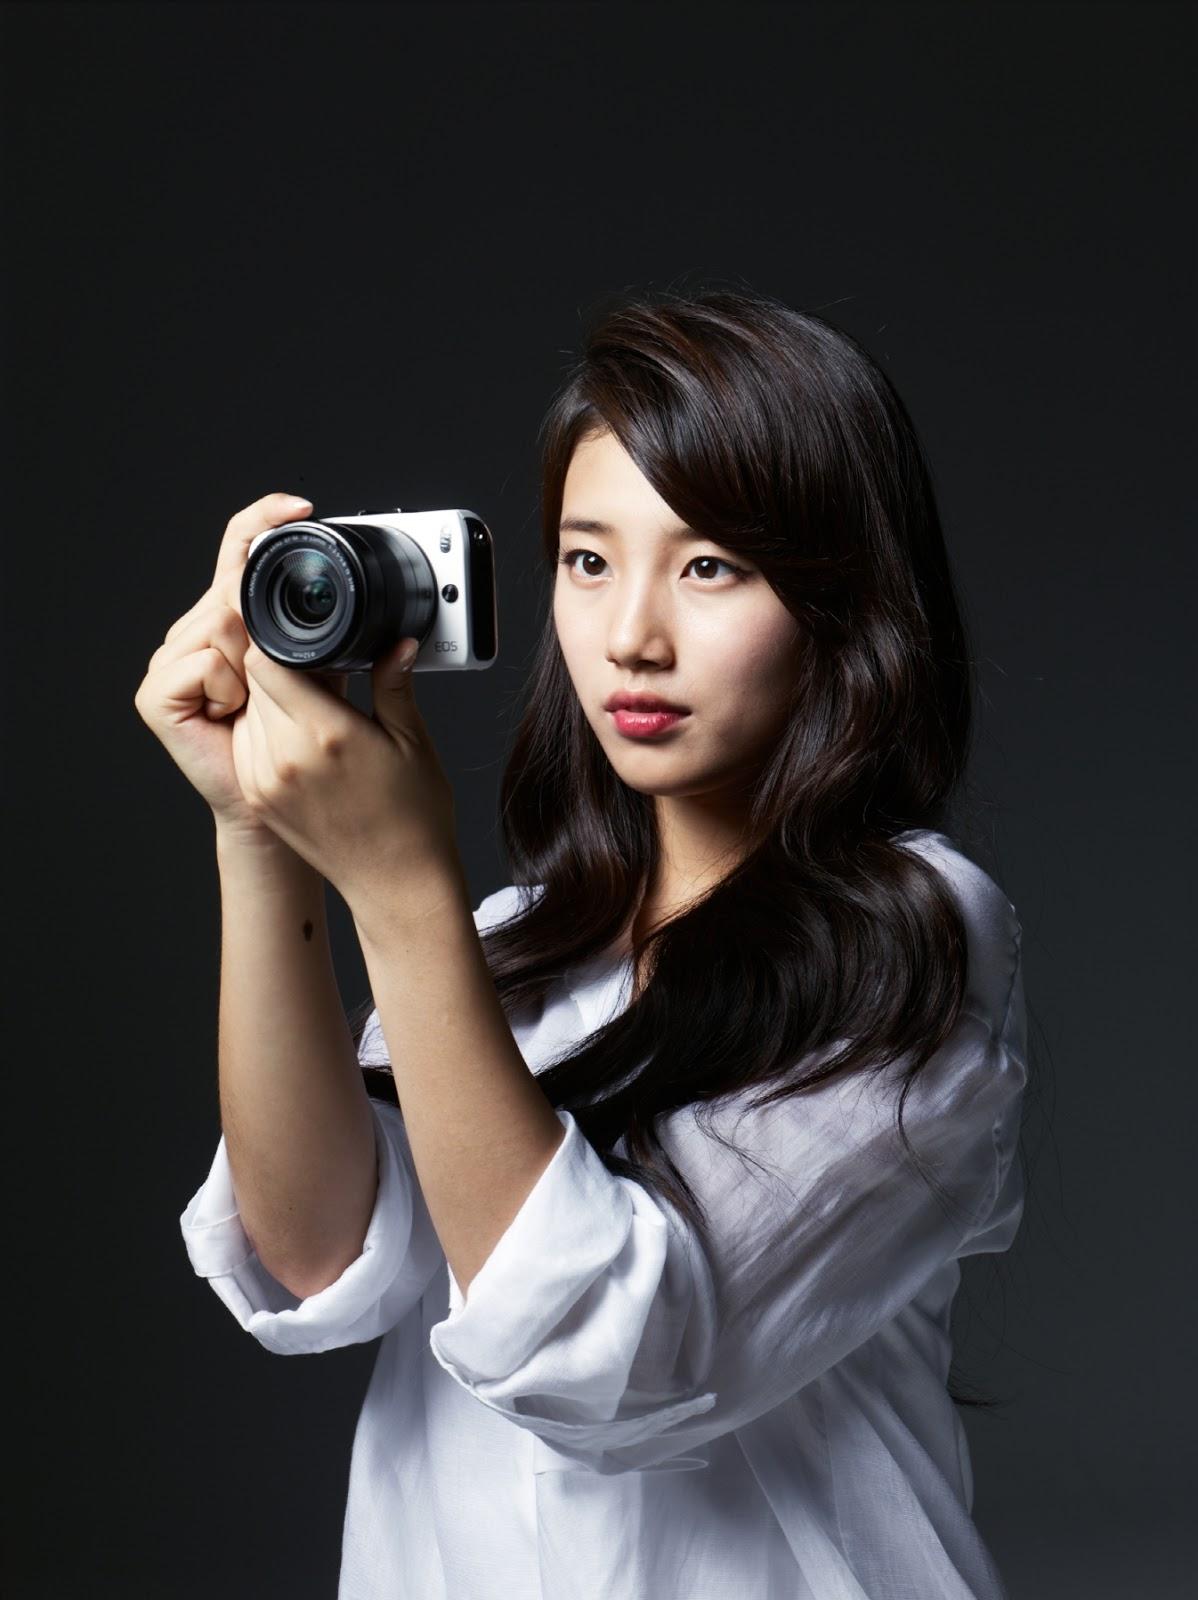 http://3.bp.blogspot.com/-EFyMI-YVKIU/UV1JDUQ-wYI/AAAAAAAAiOs/y_BUFF30r2s/s1600/Miss-A-Suzy-%EC%88%98%EC%A7%80-Canon-photos-13.jpg